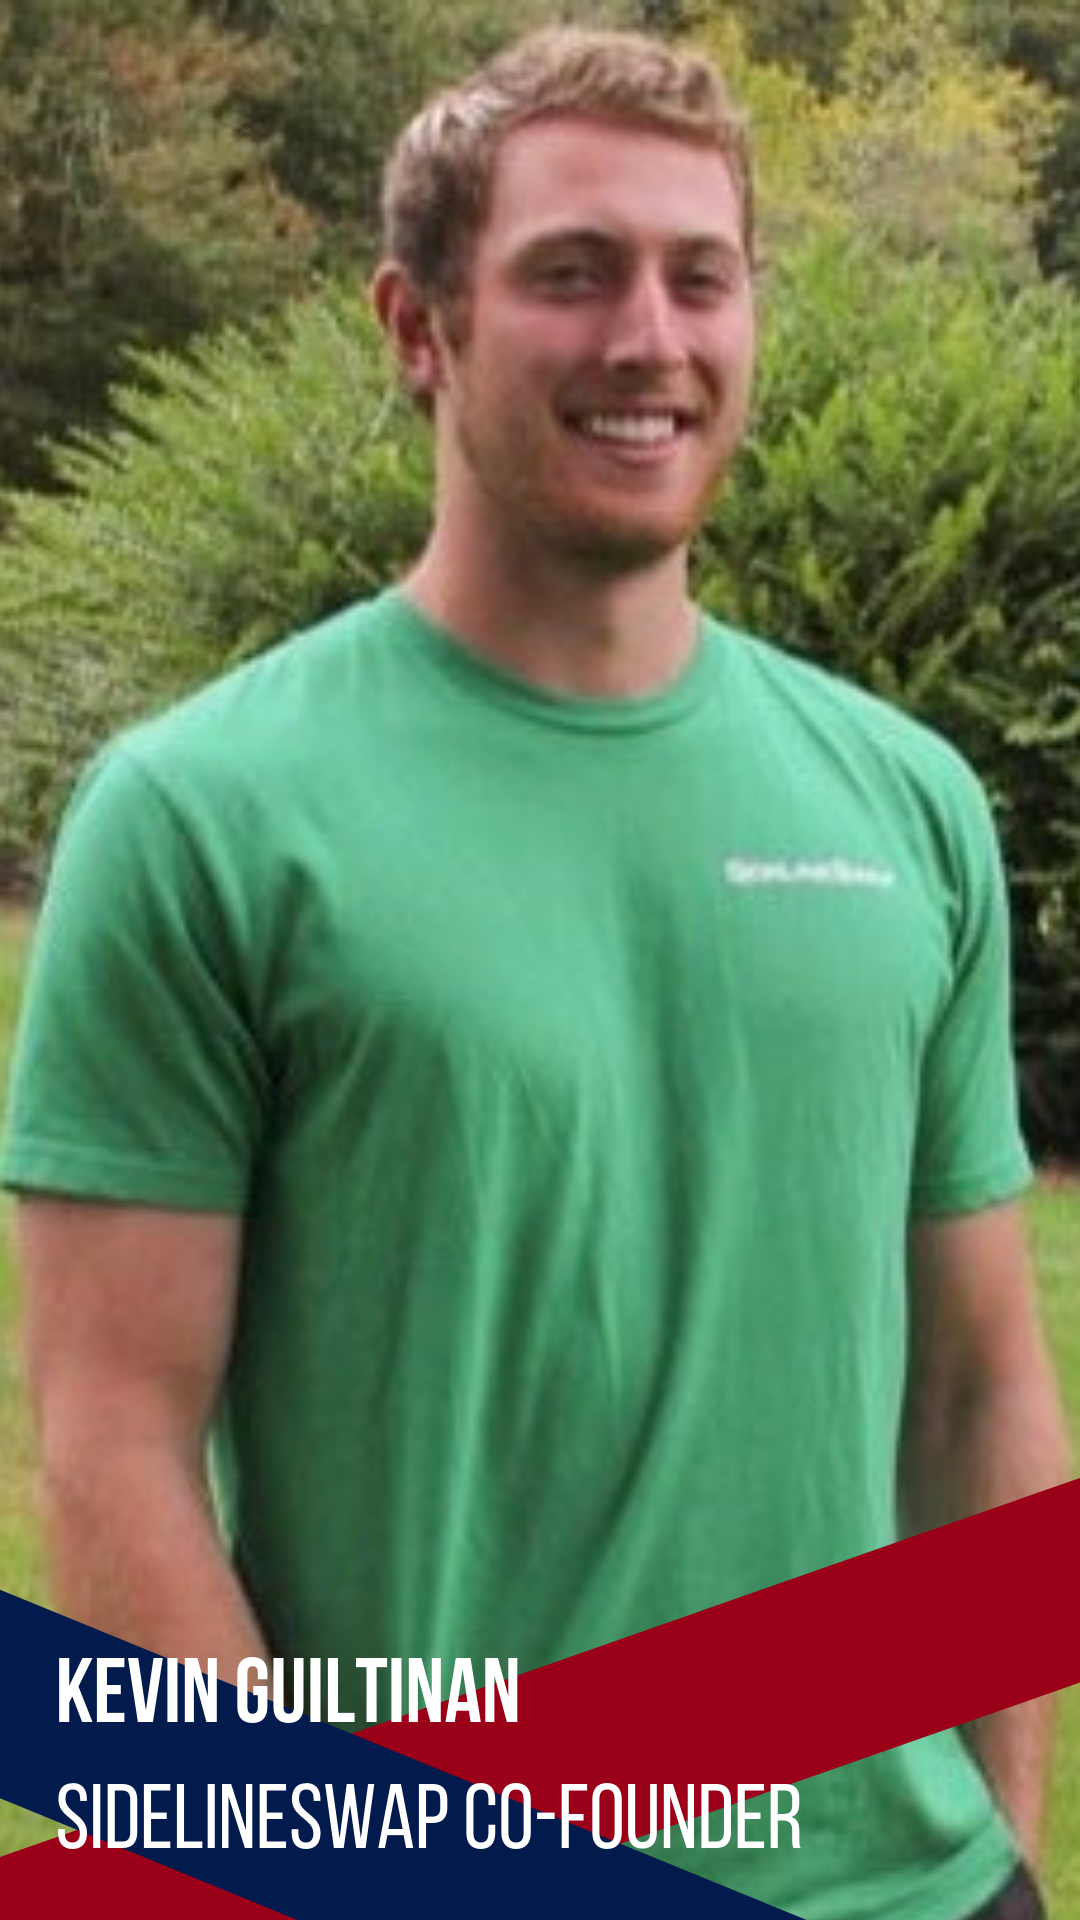 Kevin Guiltinan ReddyYeti